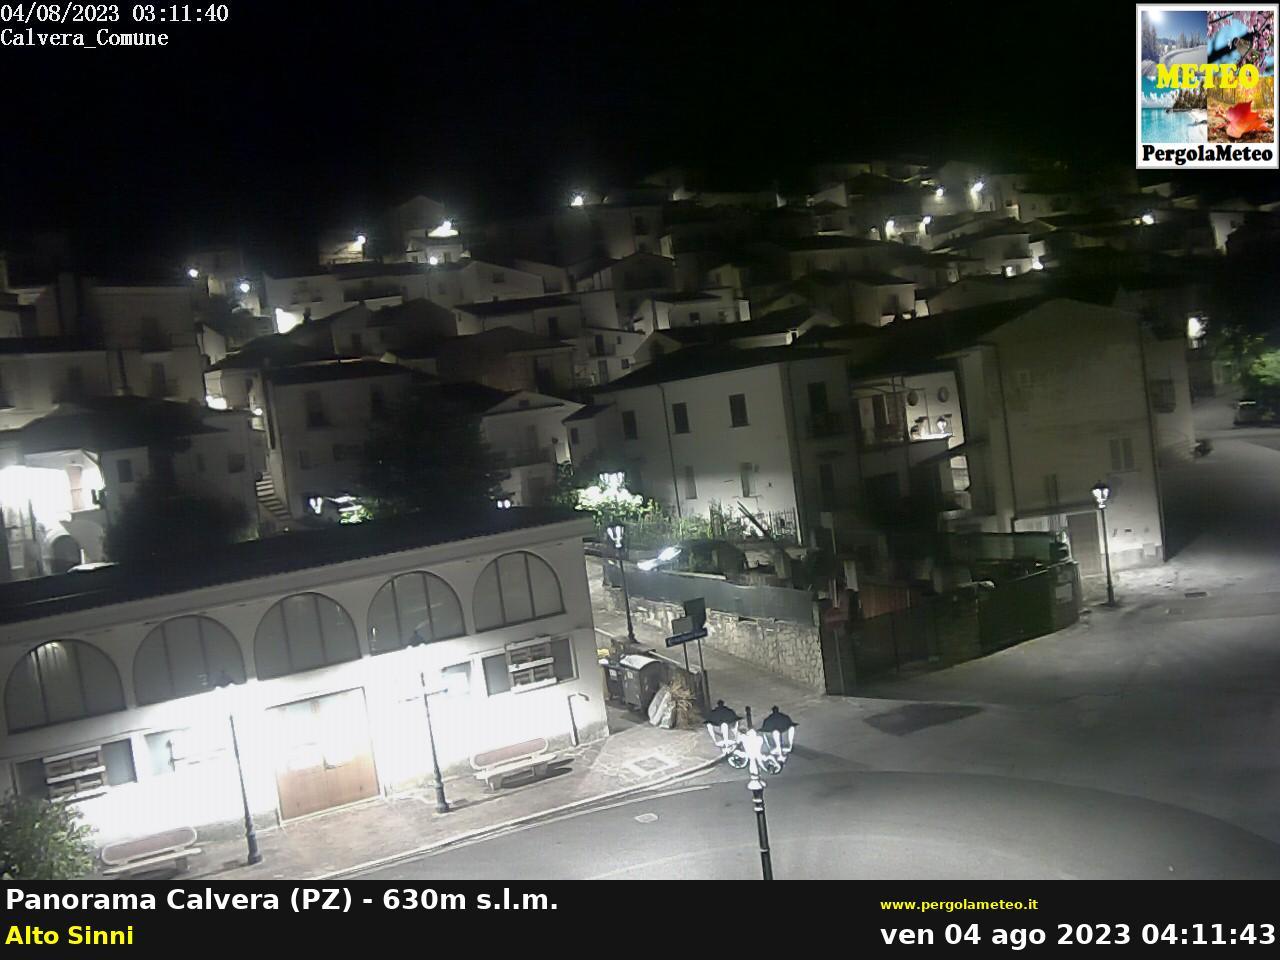 http://www.pergolameteo.it/joomla/calvera/FI9828P_00626E6467B4/snap/webcam.php